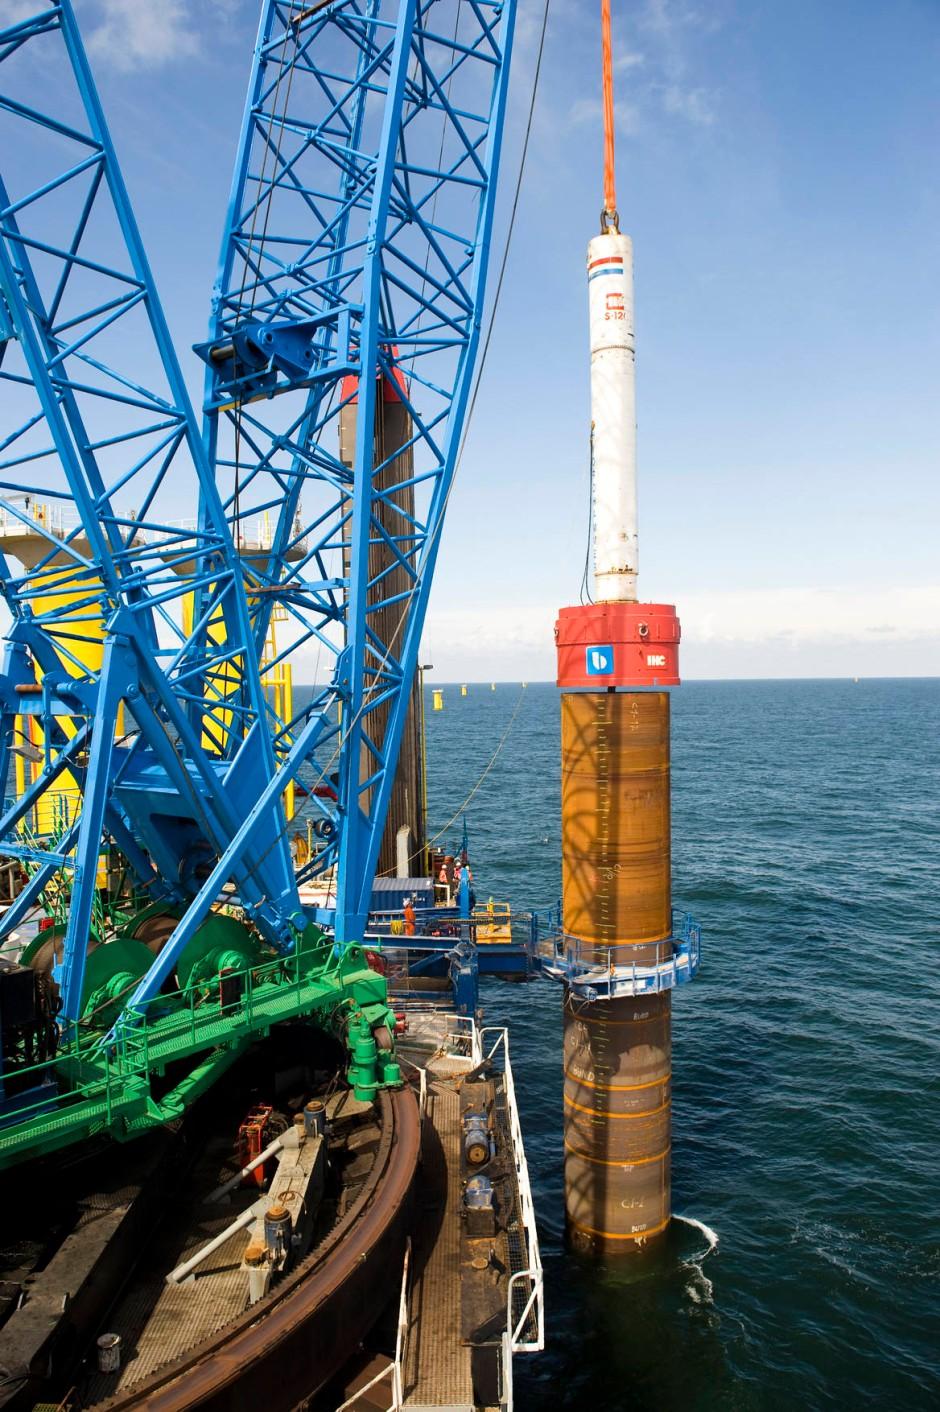 Kücheninsel Am Boden Befestigen ~ seite 2 offshore wind (3) befestigen am boden technik& motor faz